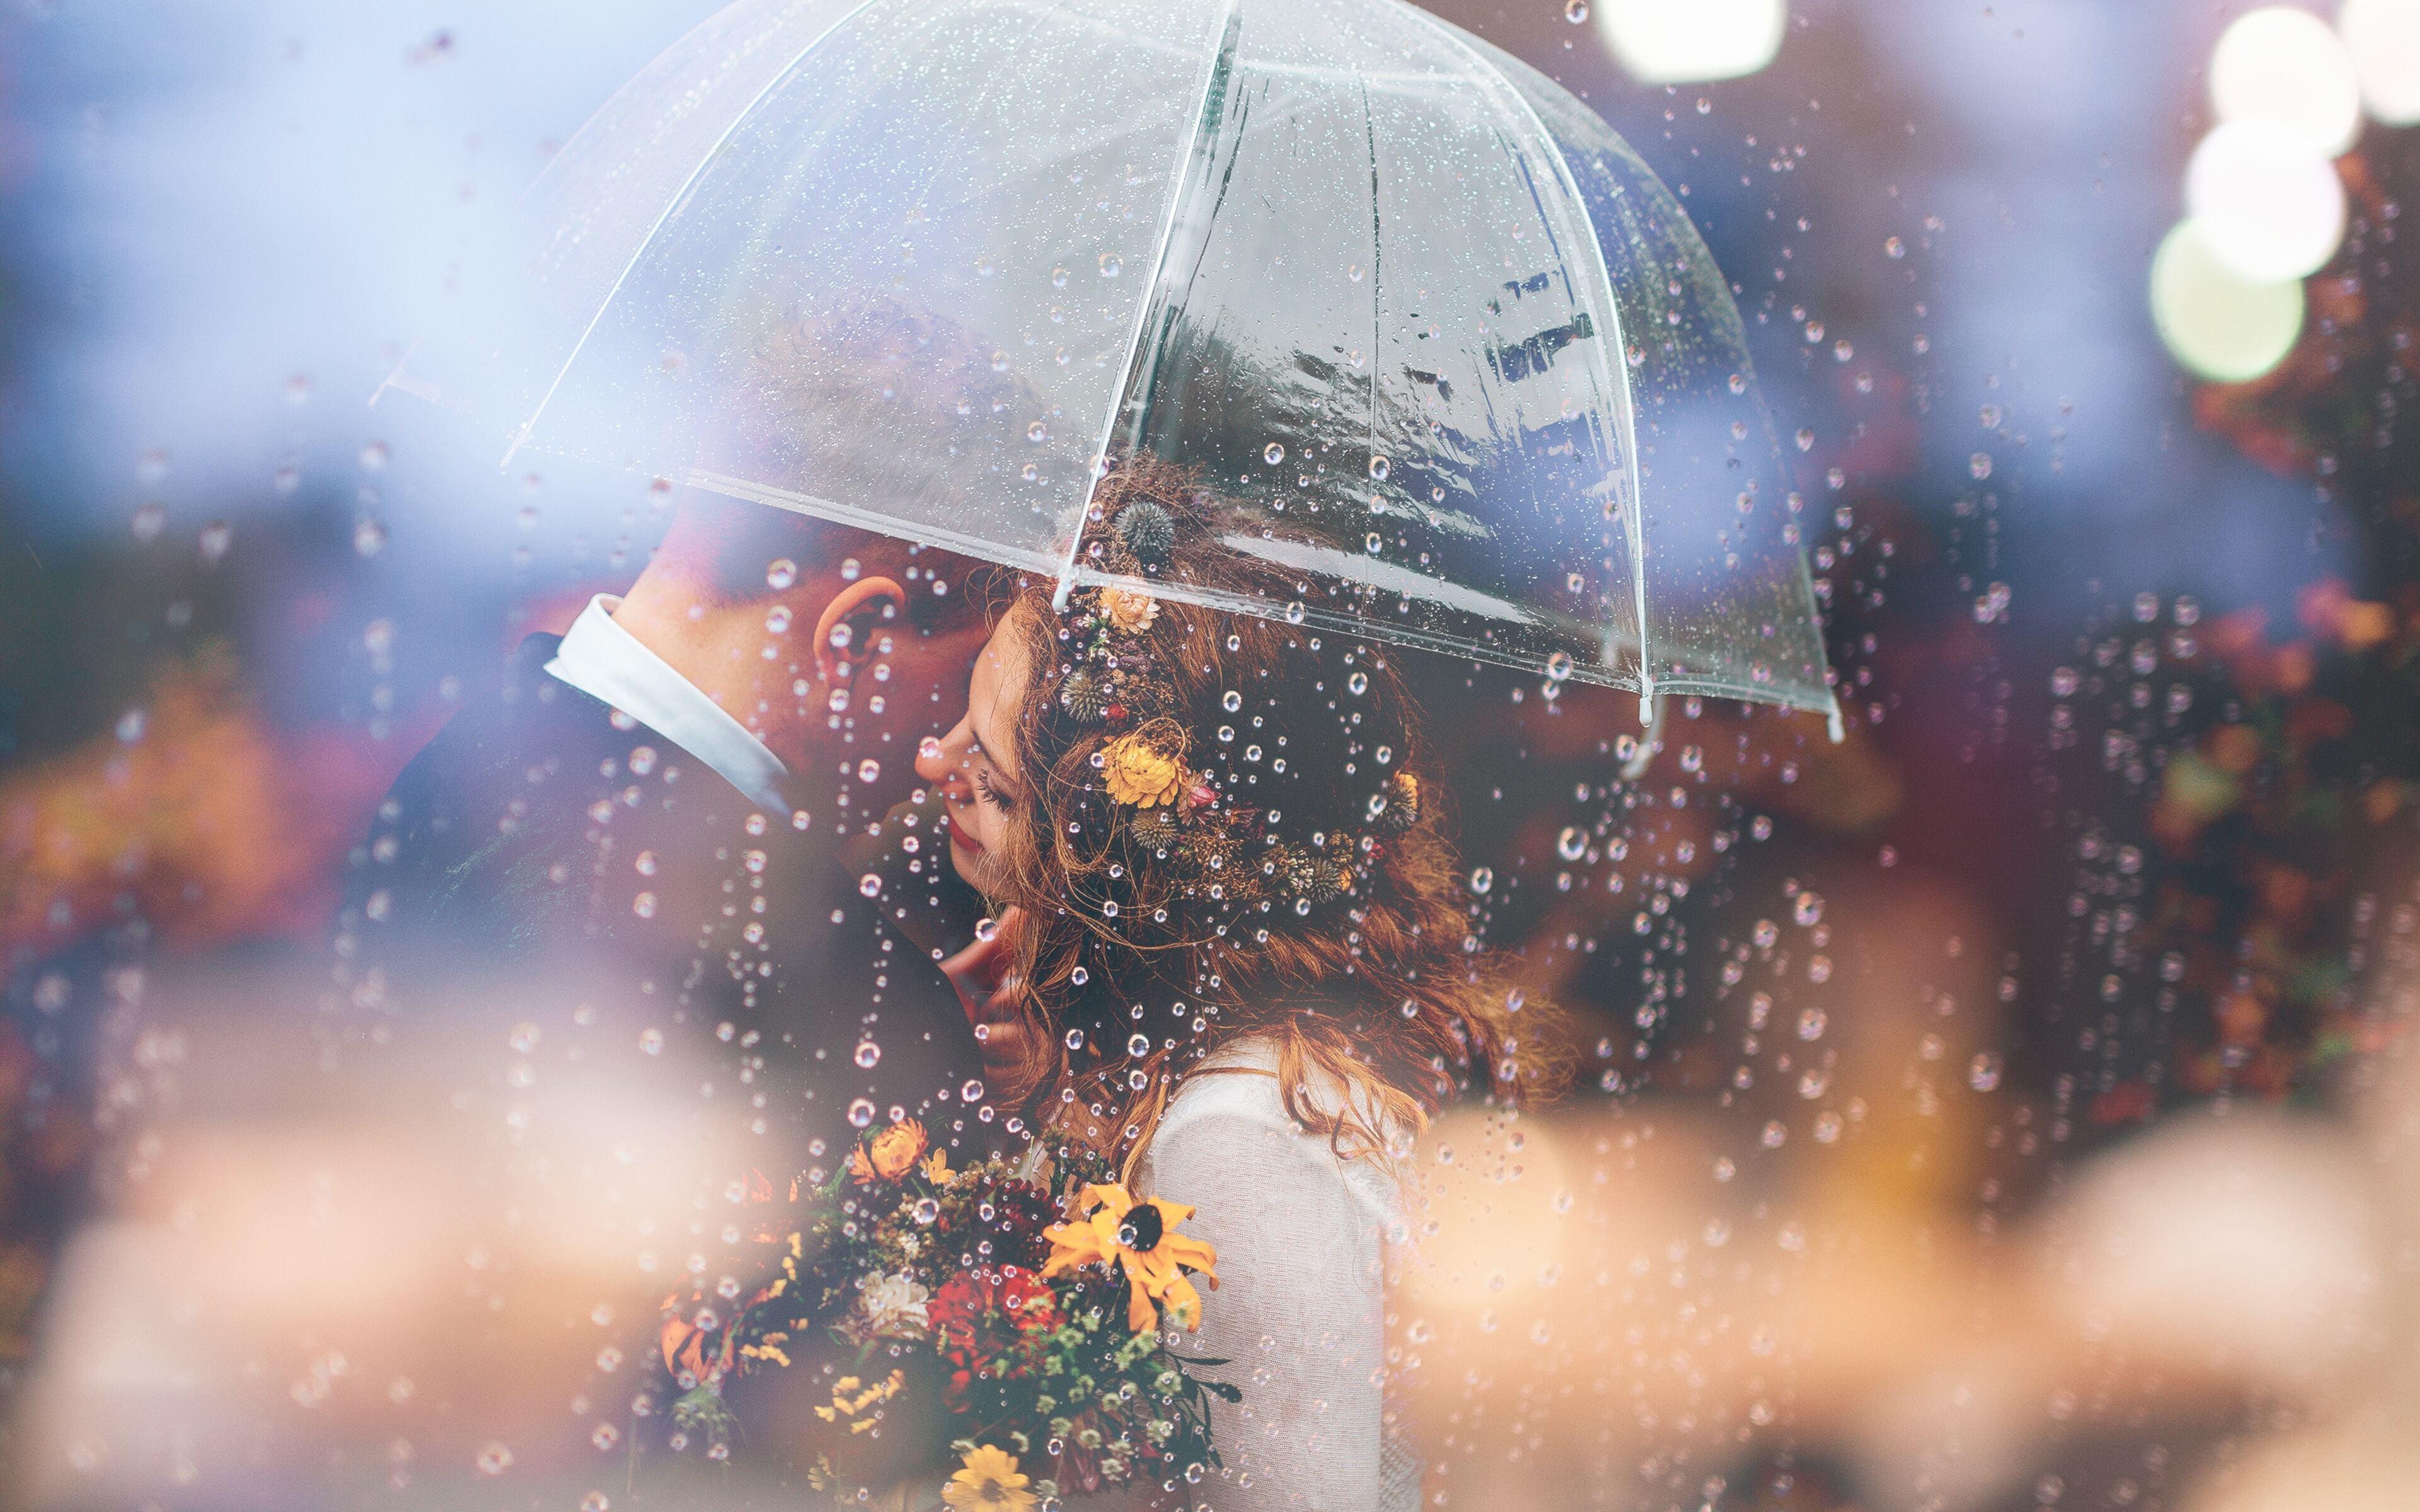 3840x2400 Married Couple Romantic Umbrella Raining Weeding 4k Hd 4k